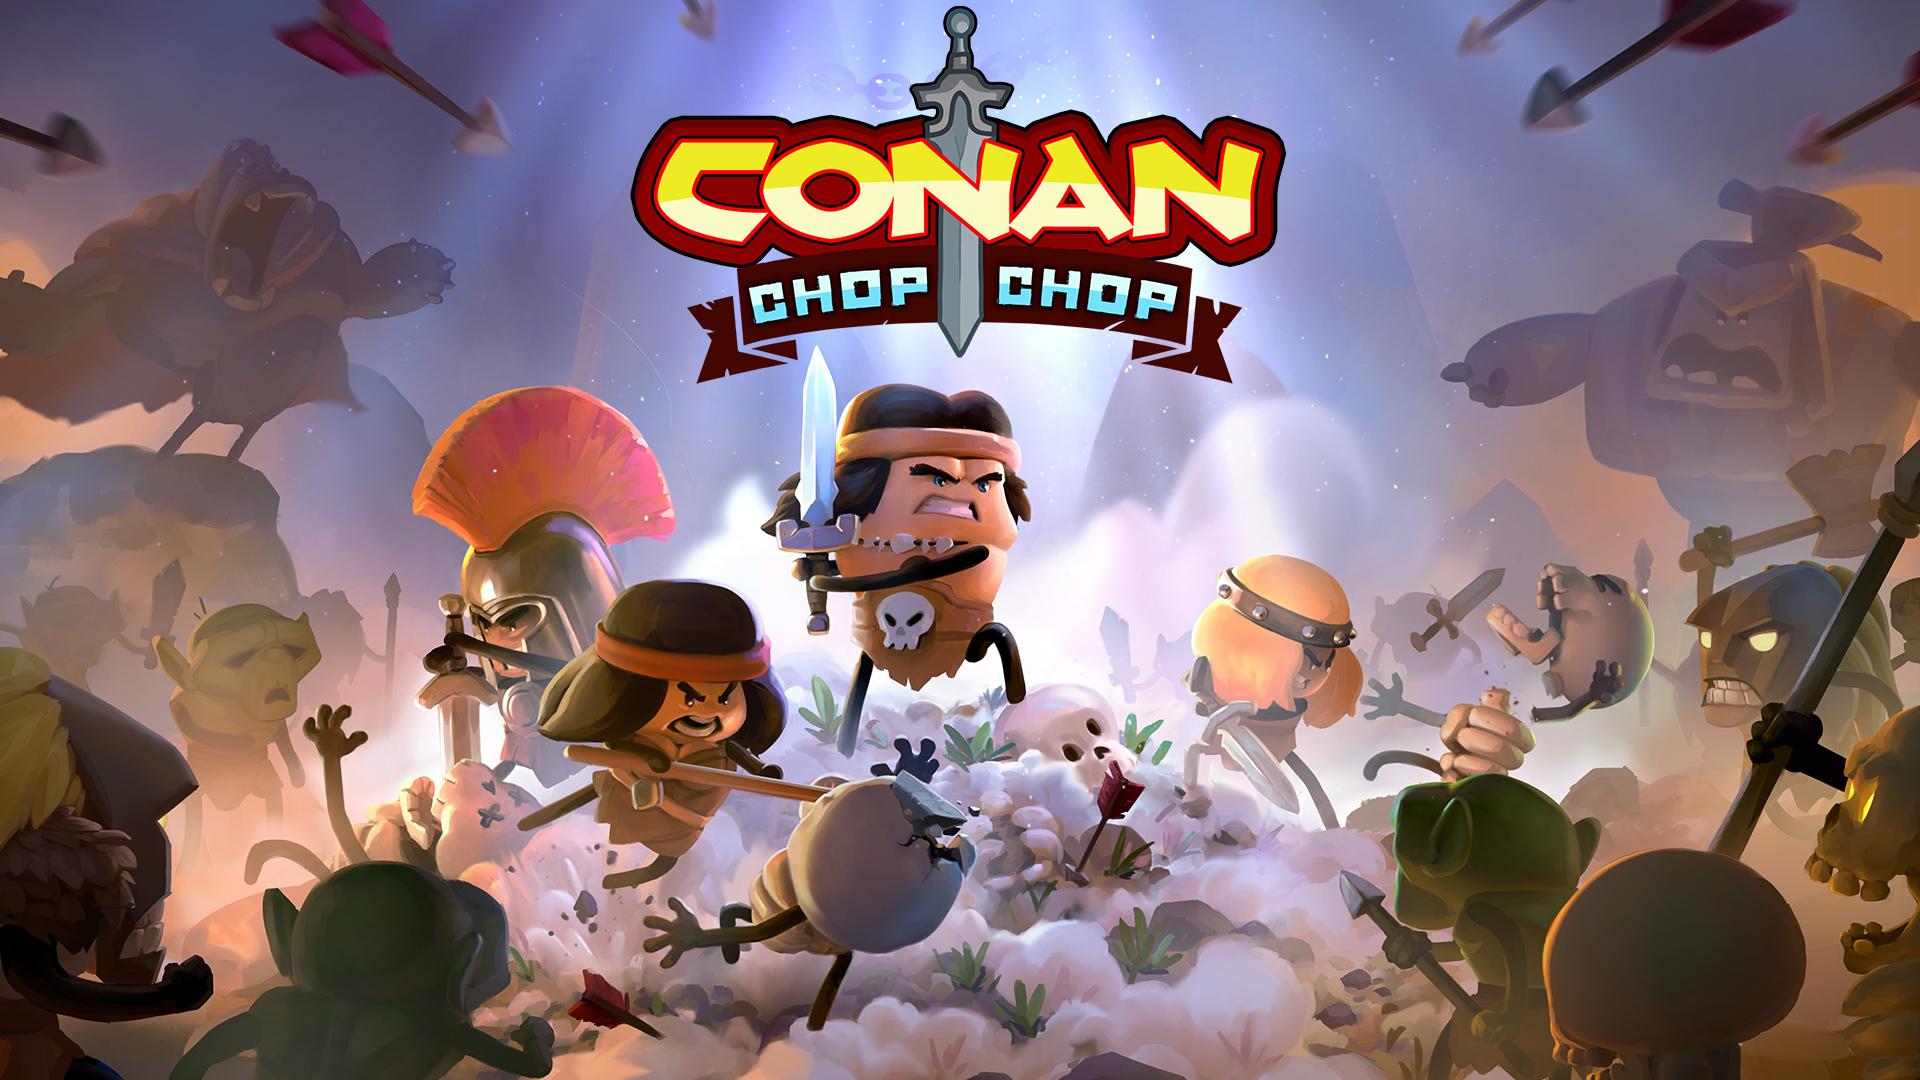 Conan Chop Chop's Release Has Been Delayed… Again